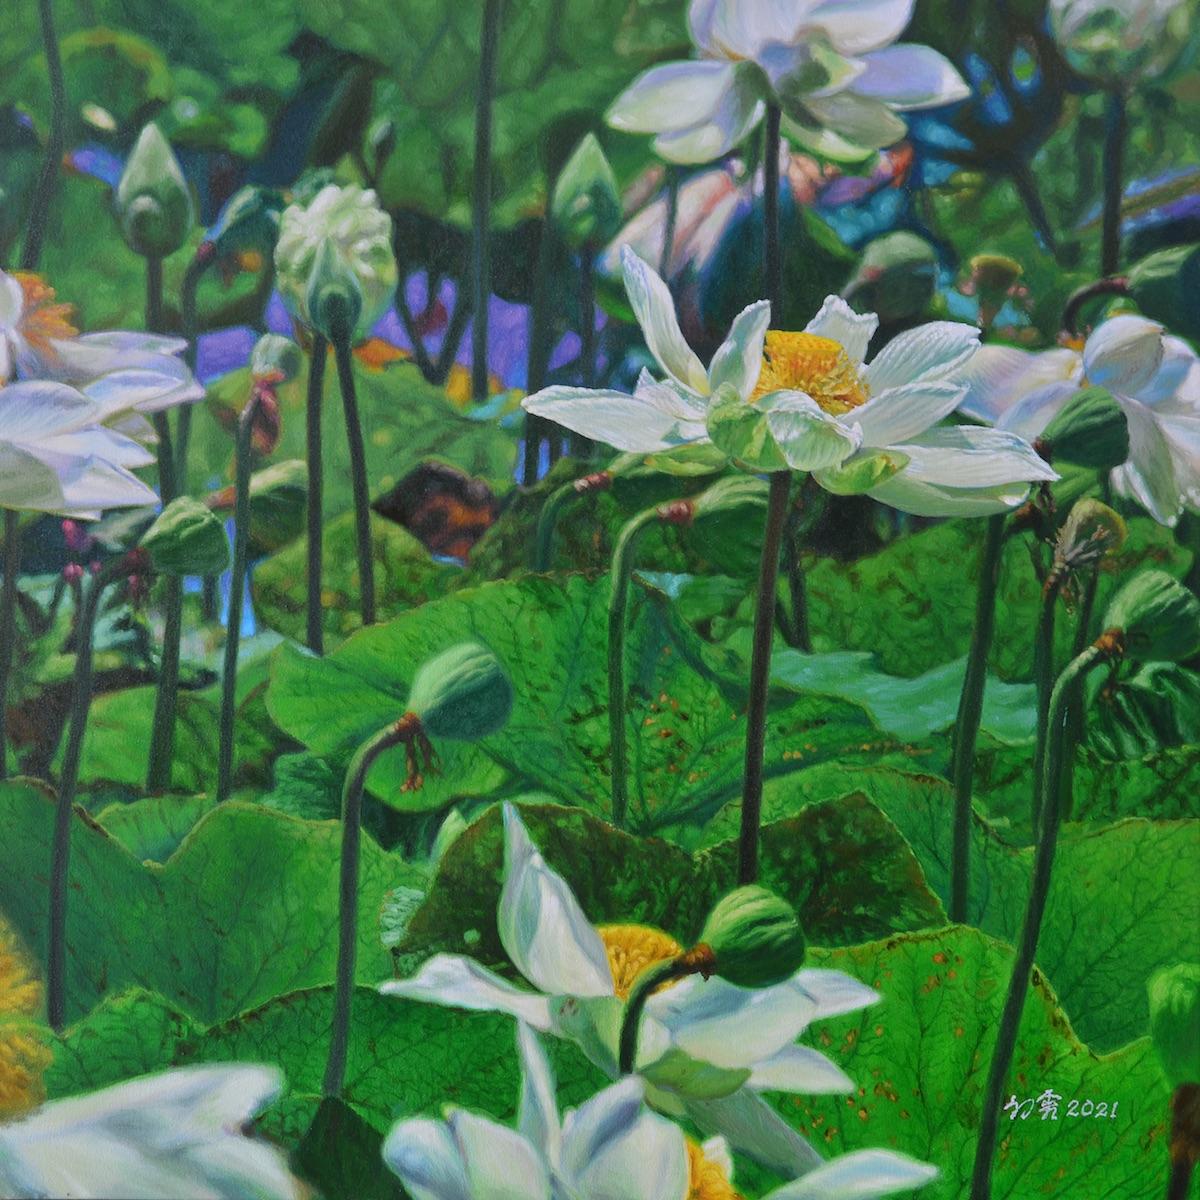 Lotus Tales, Hosba Story by Da Niu (CK Khor)